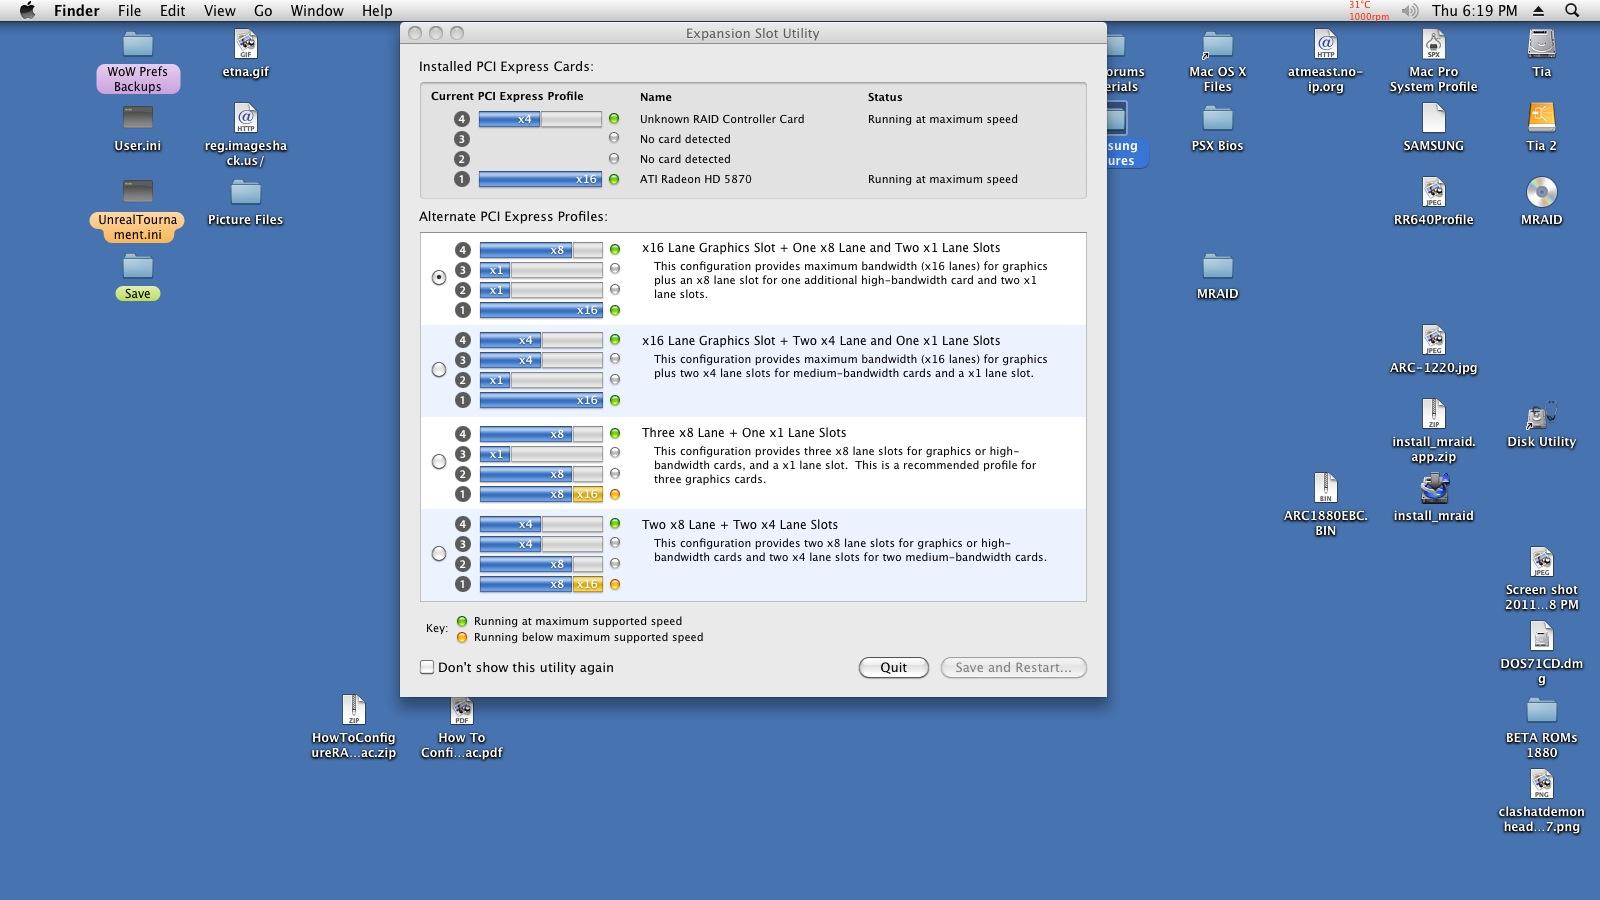 Areca 1880ix-12 issues on Mac Pro 1,1 :( | MacRumors Forums